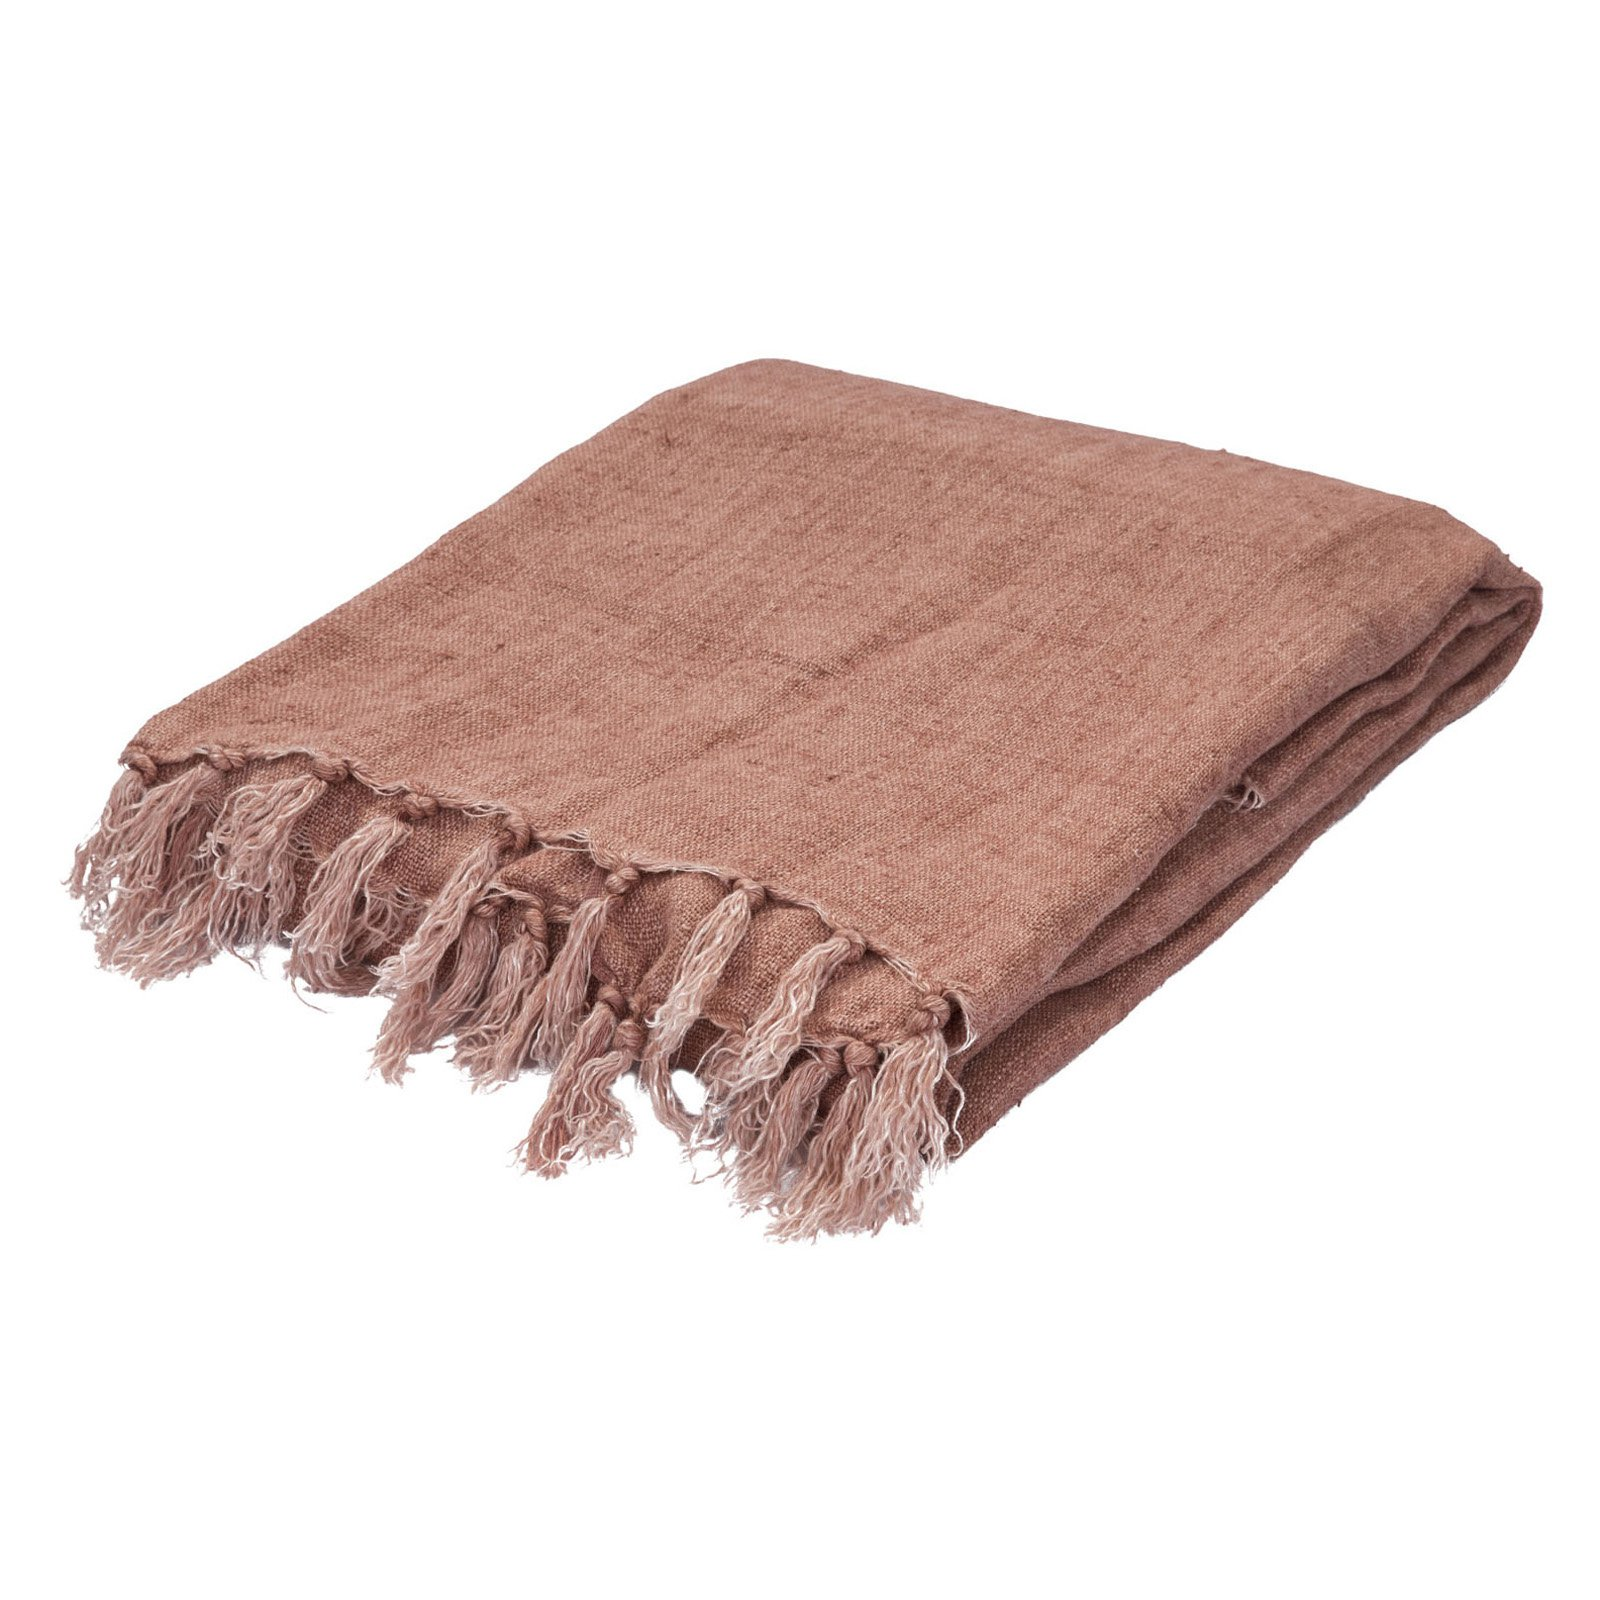 Jaipur Madura Linen Throw